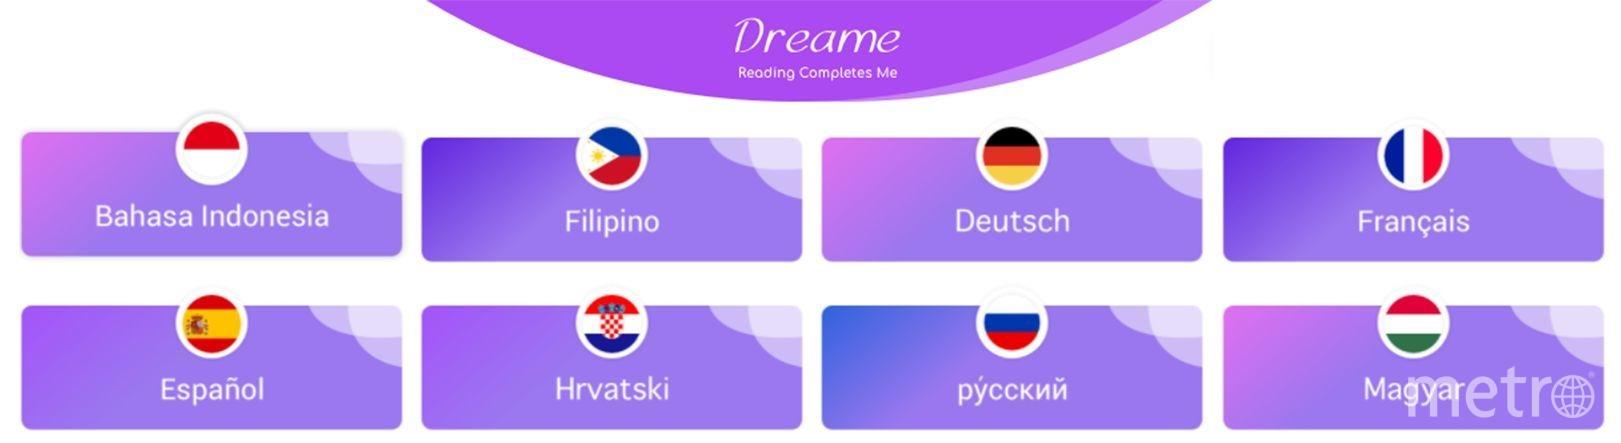 Онлайн-платформа для писателей Dreame.